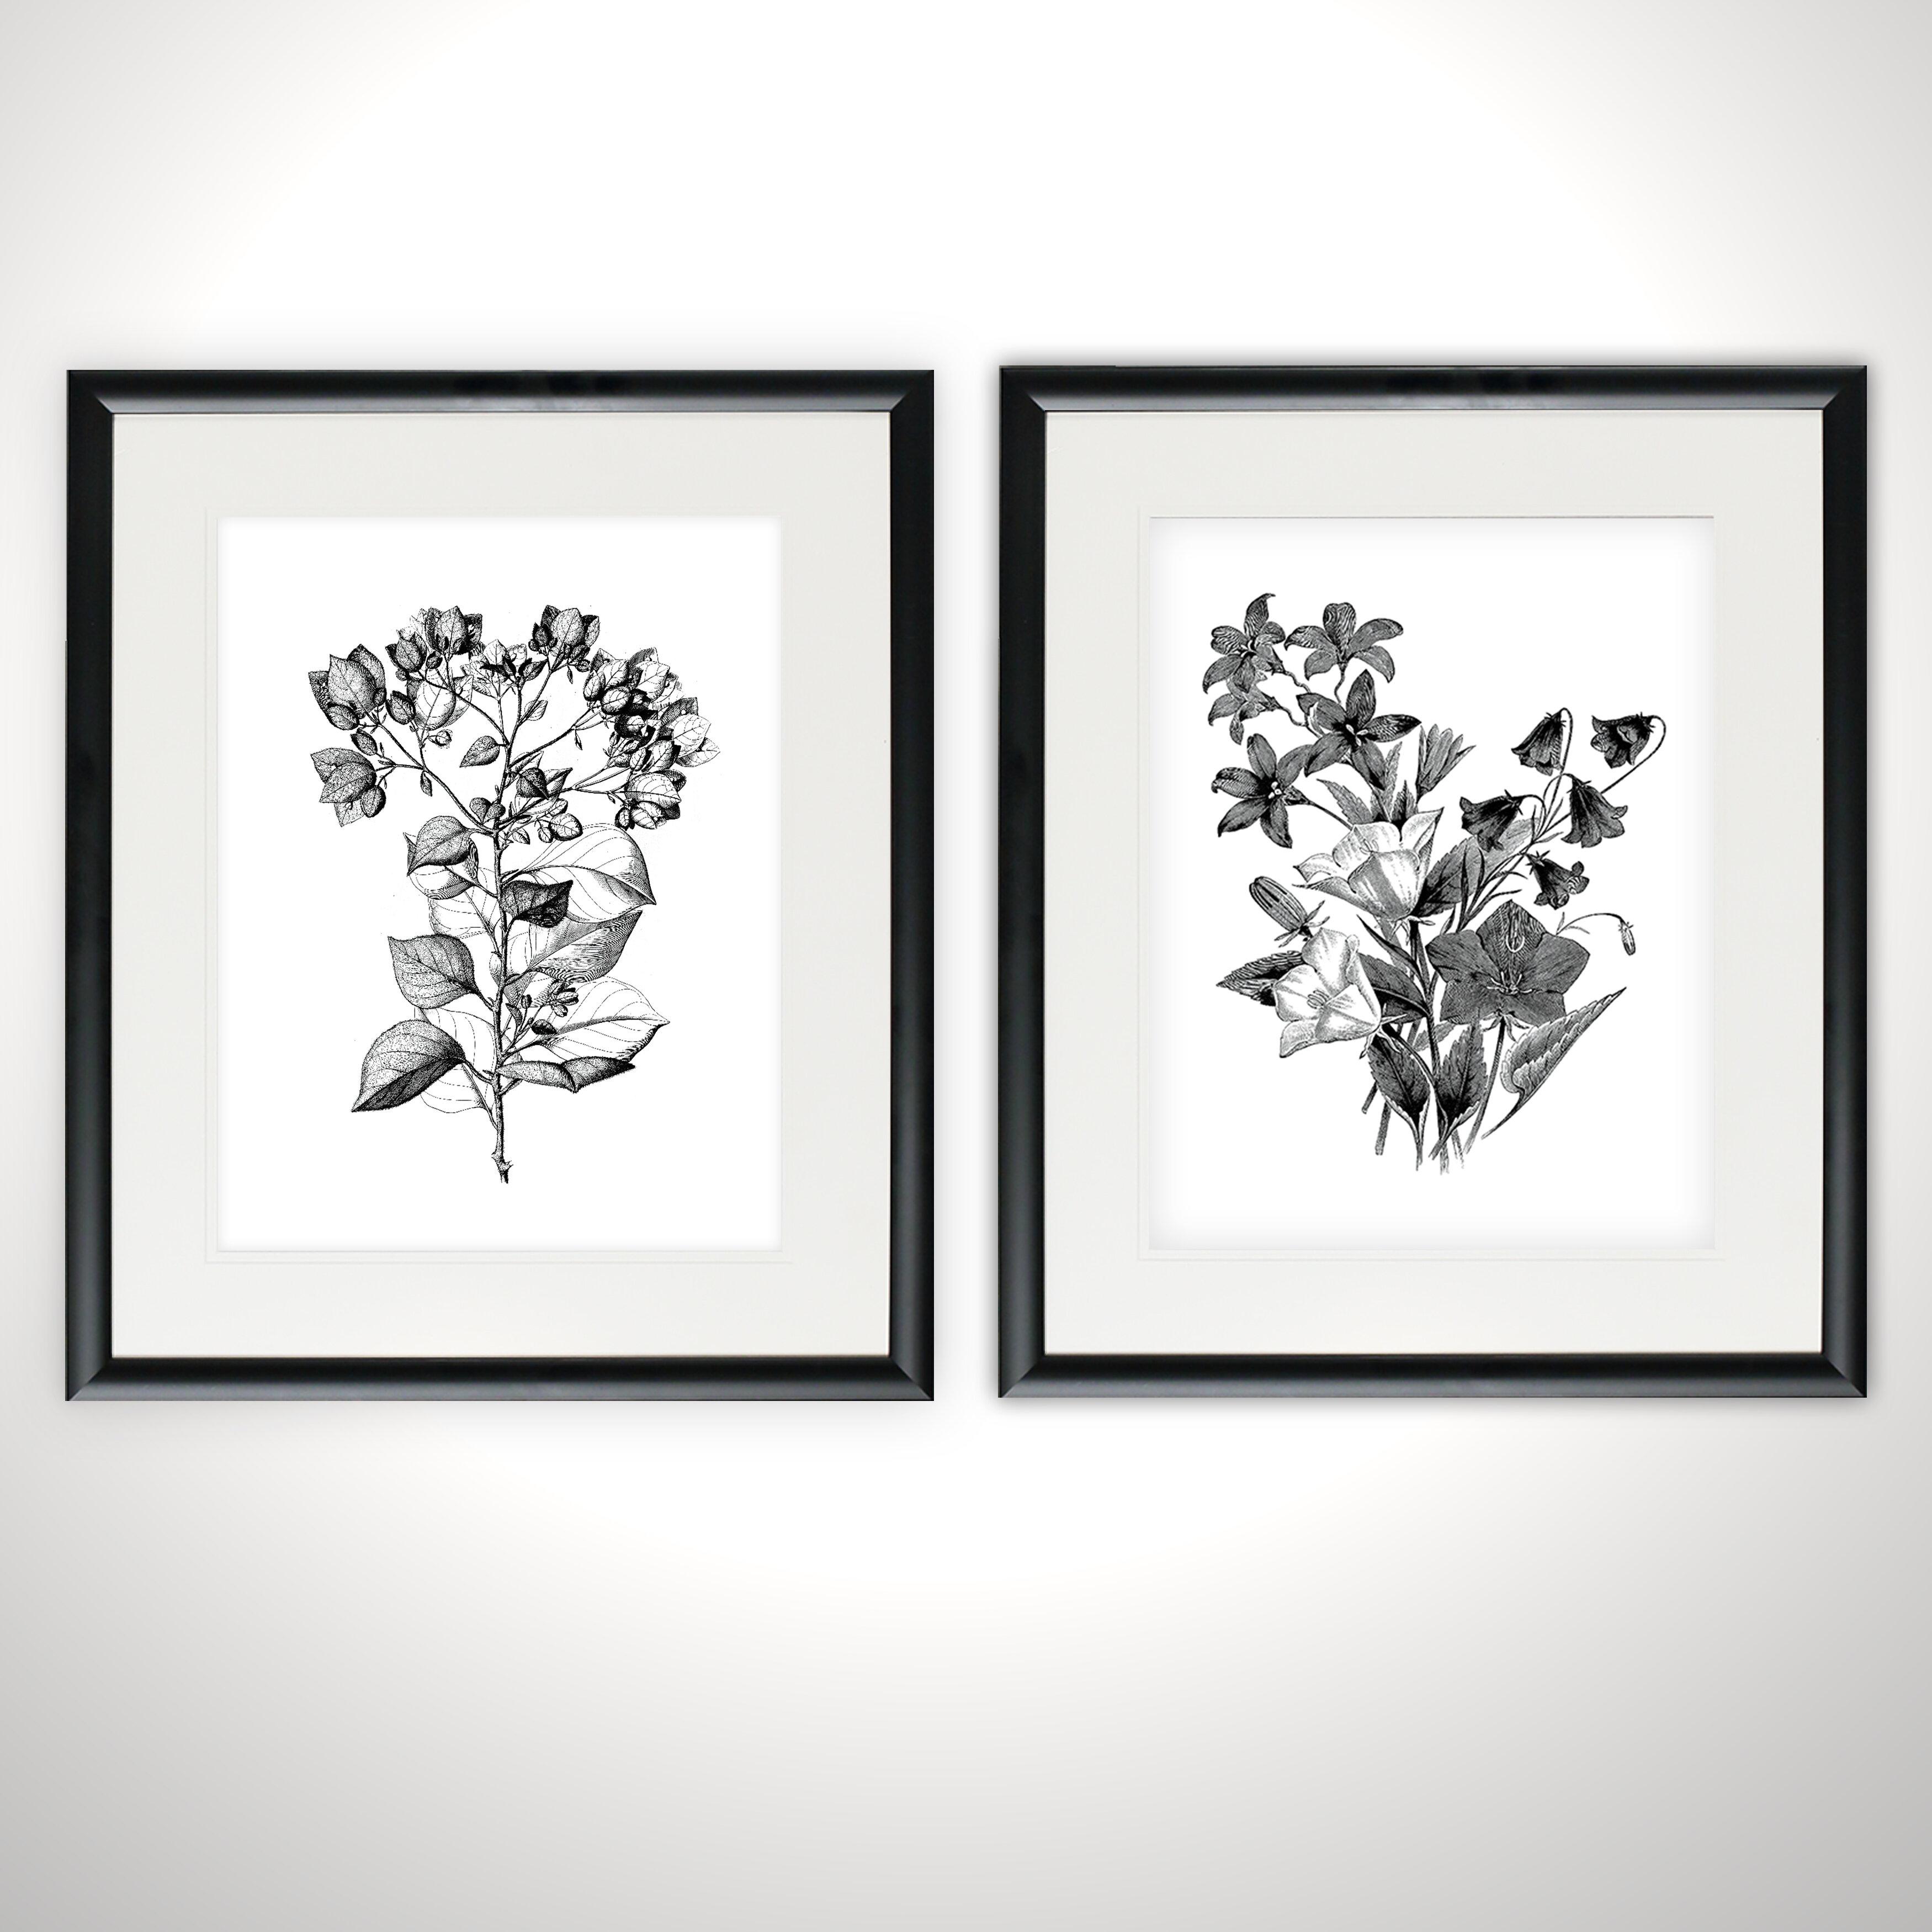 d4e9d9142fb  Botanical Black and White  2 Piece Framed Acrylic Painting Print Set    Reviews